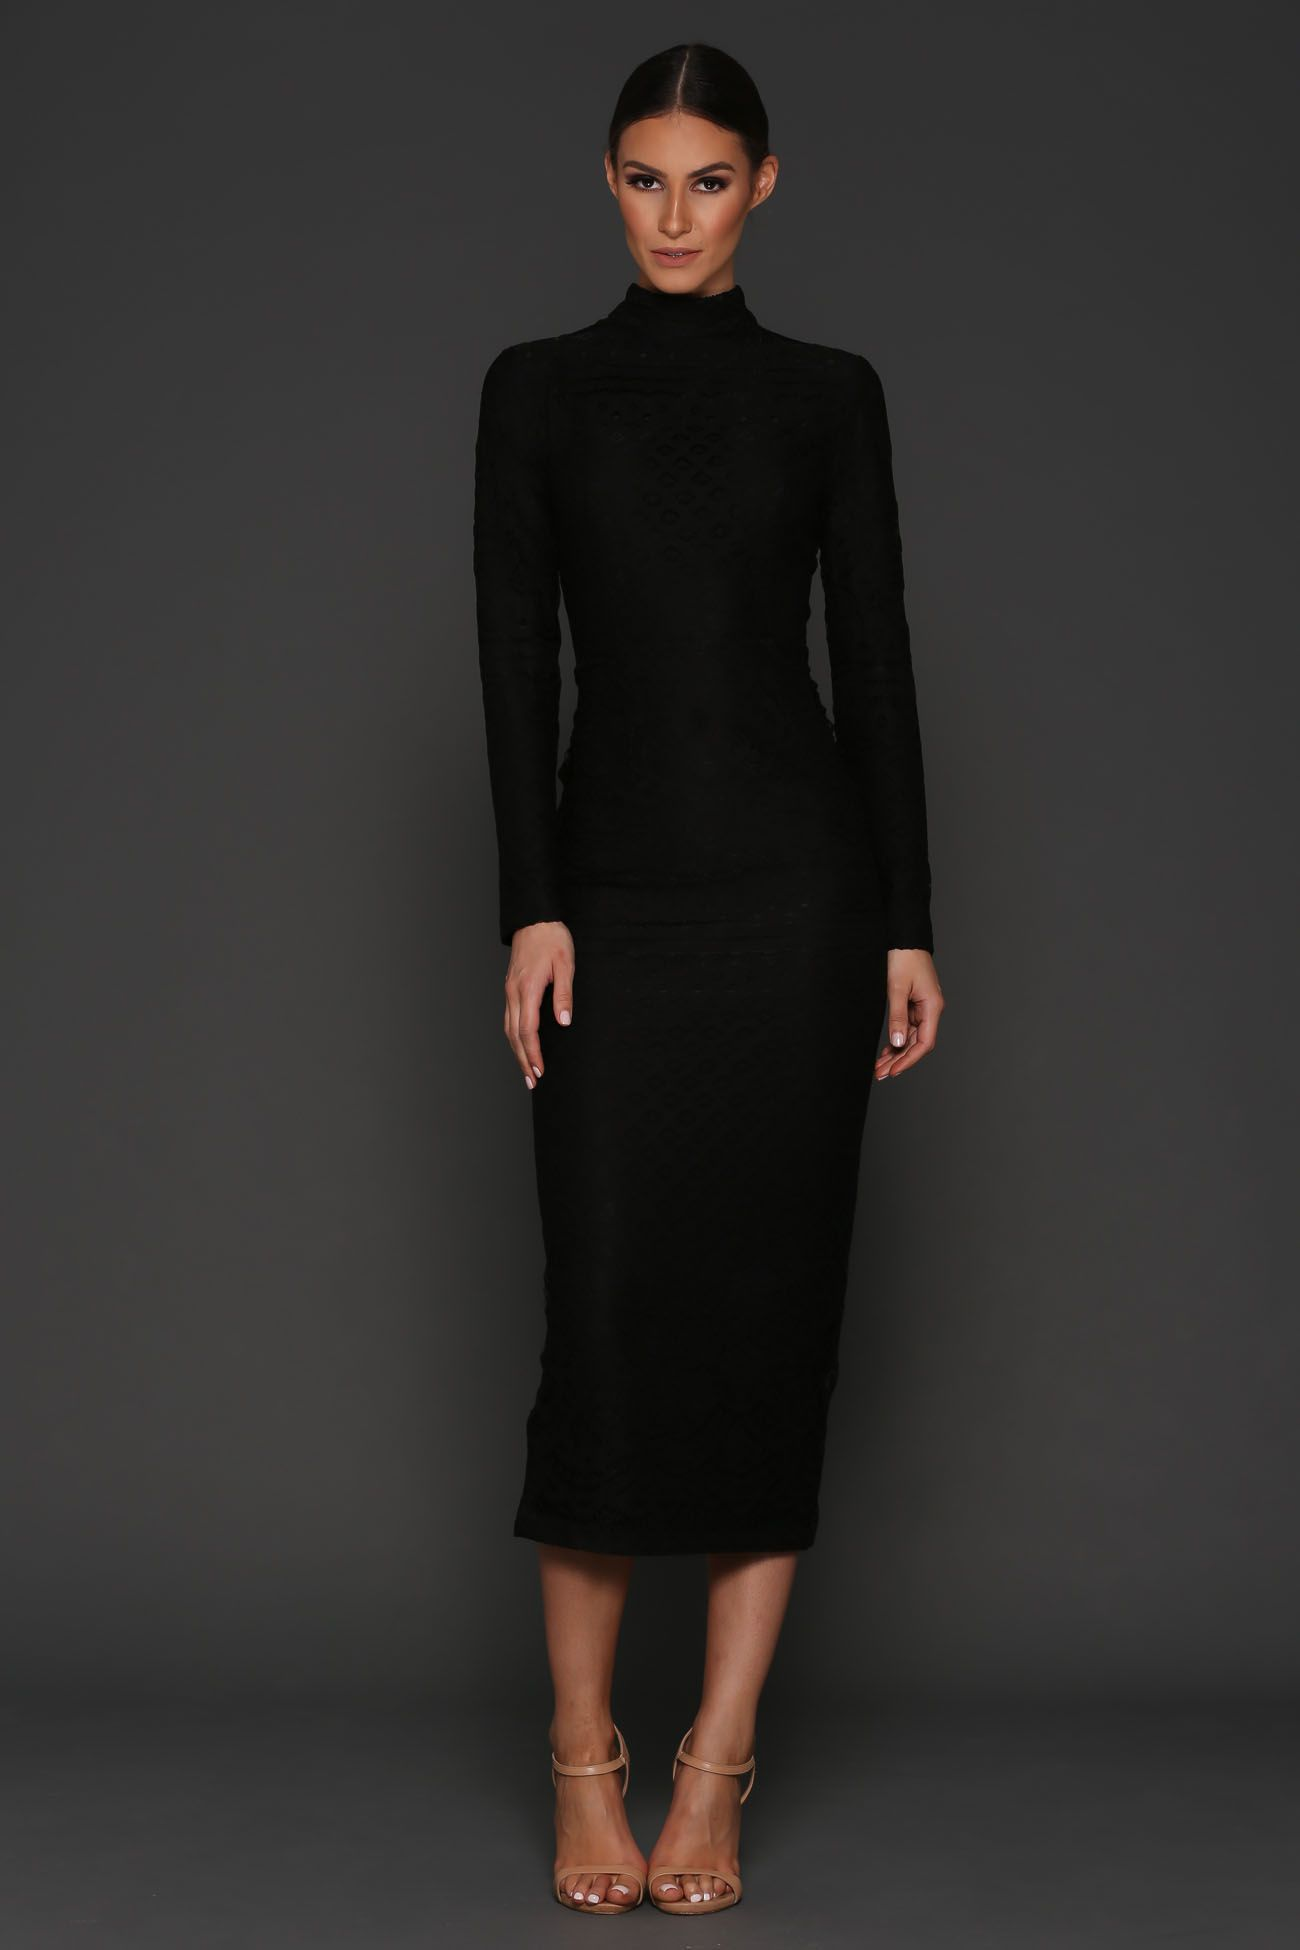 Bernice Black Evening Dresses Australia Dresses Australia And